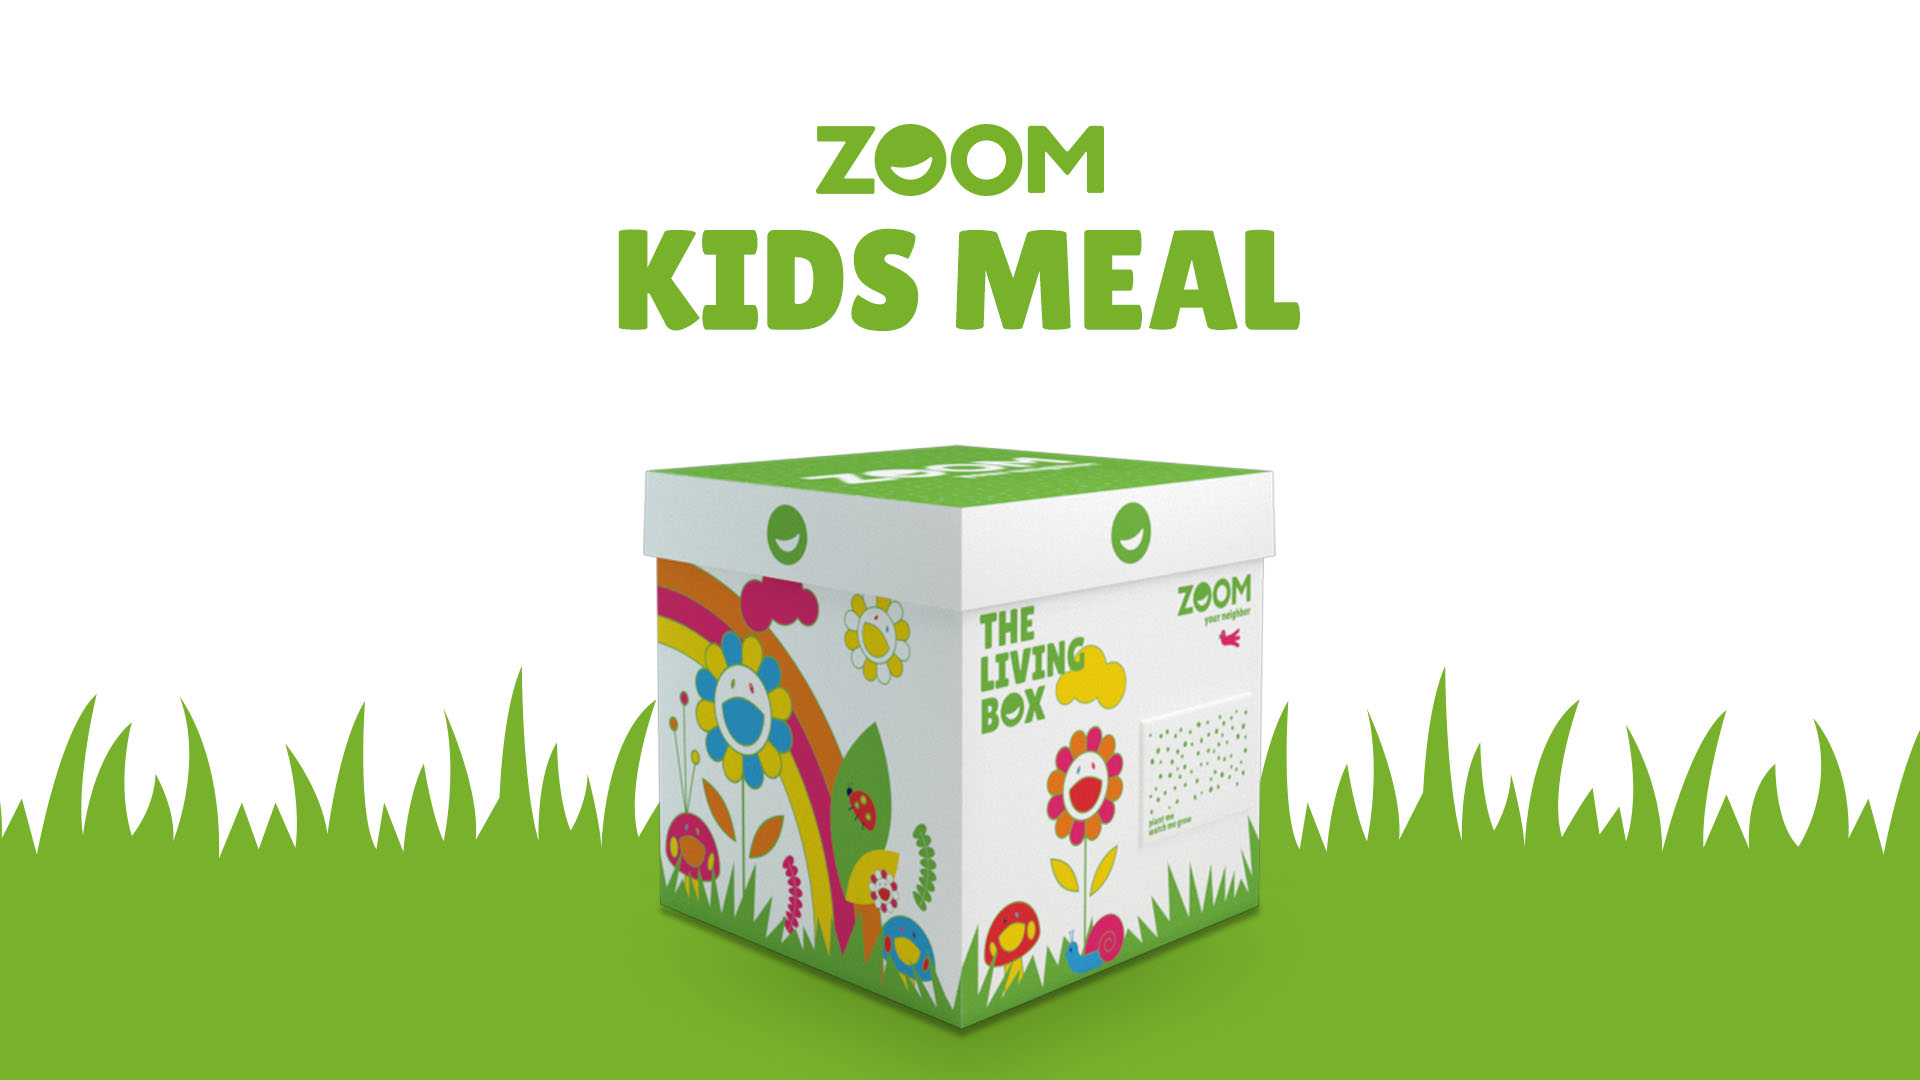 ZOOM Kids Meal